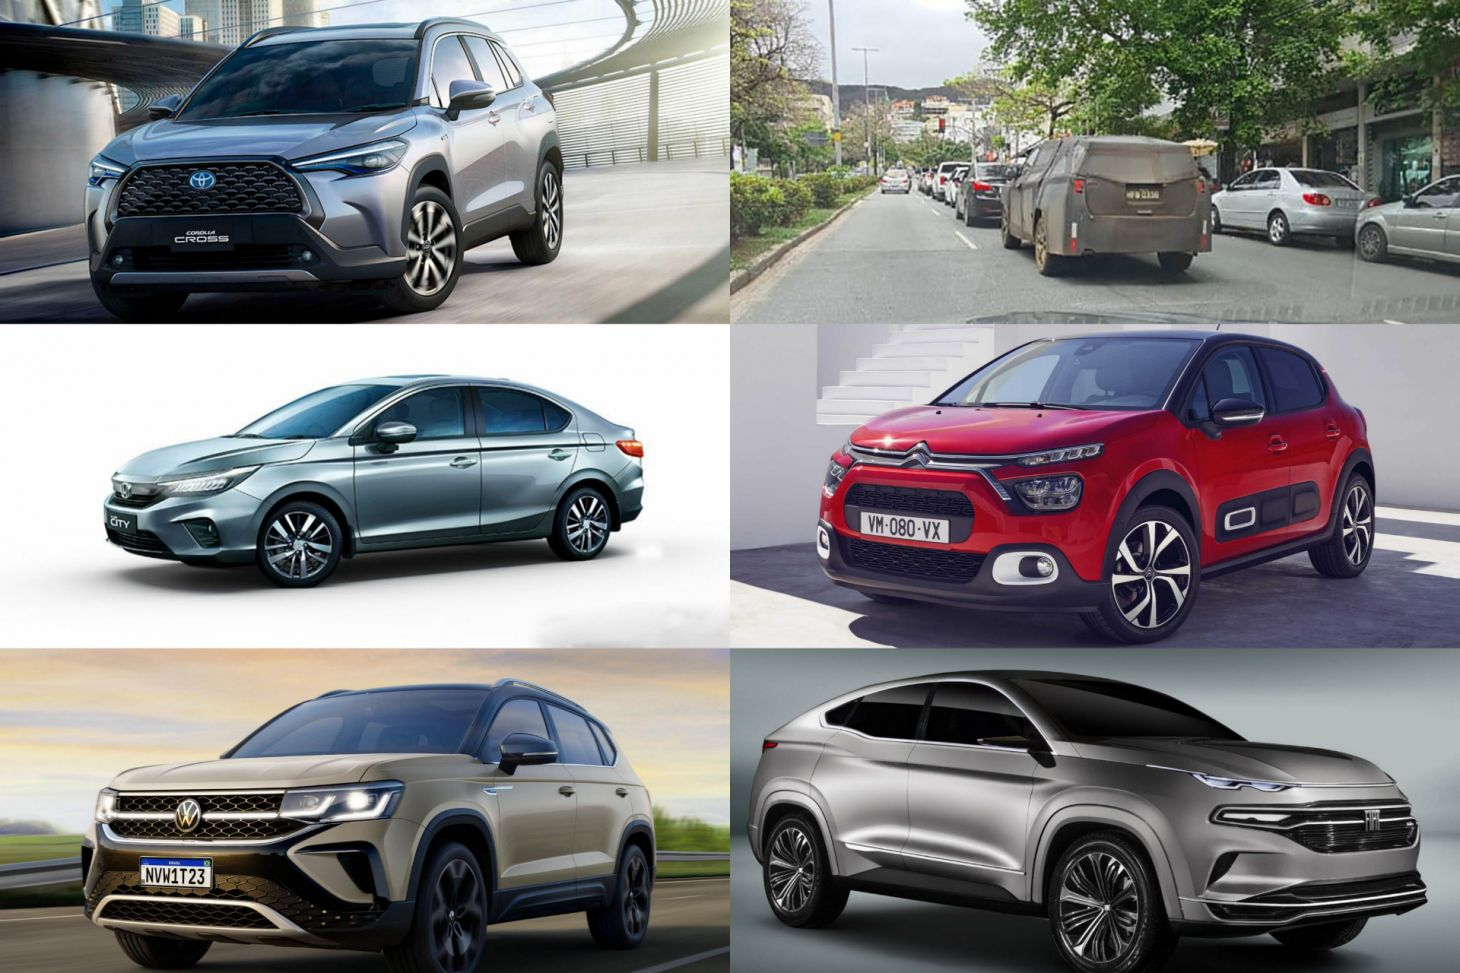 novidades automotivas carros 2021 suvs utilitarios esportivos hatches volkswagen taos fiat fastback honda city corolla cross citroen c3